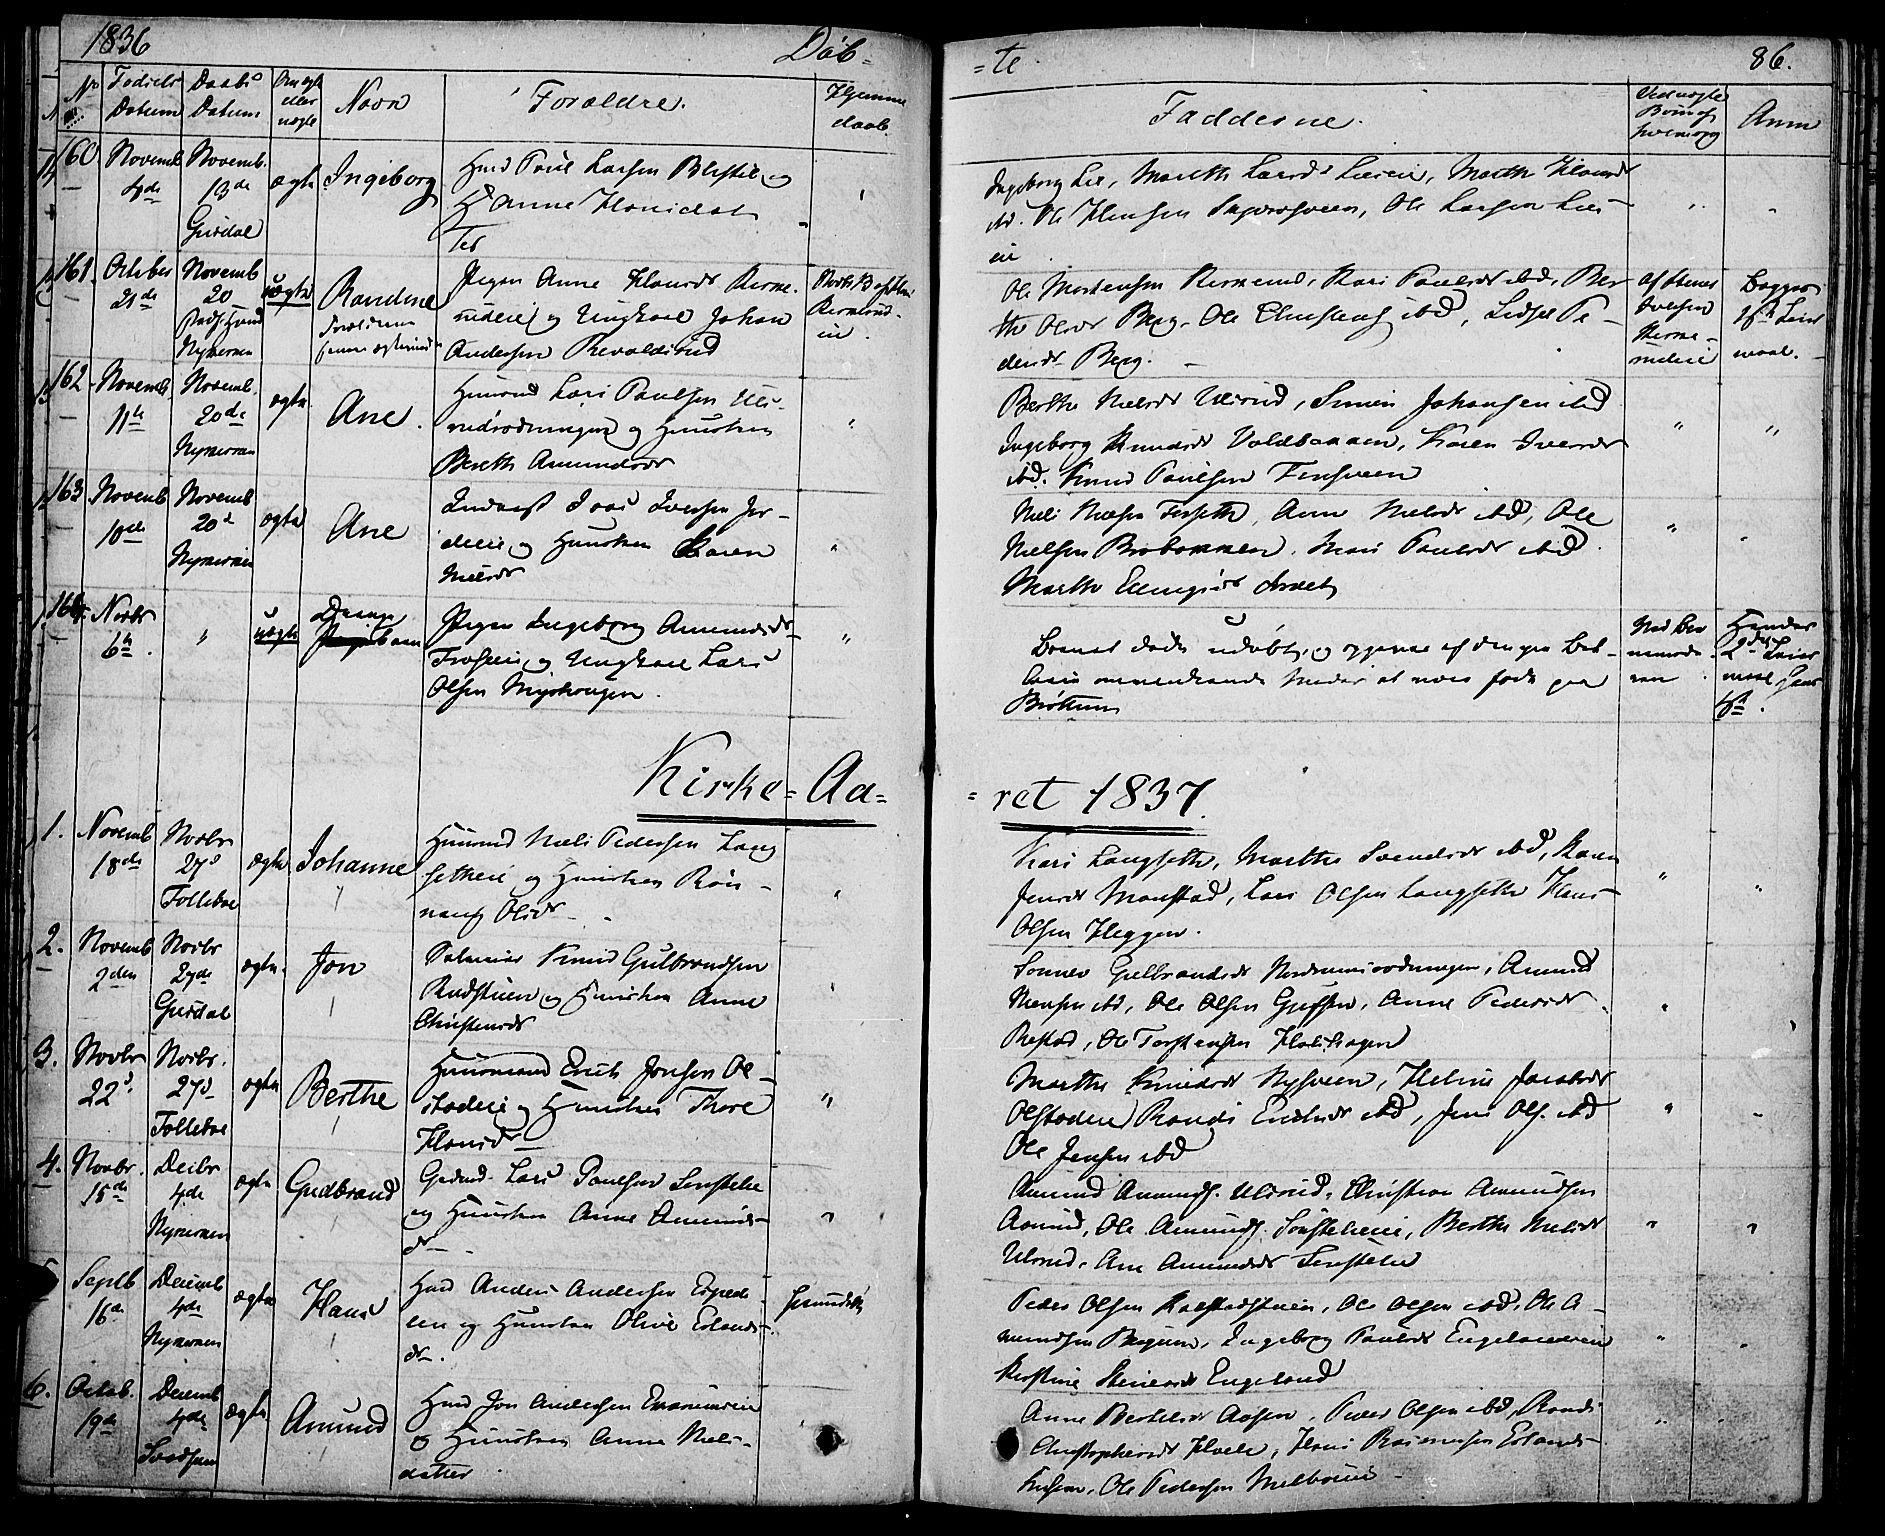 SAH, Gausdal prestekontor, Ministerialbok nr. 6, 1830-1839, s. 86